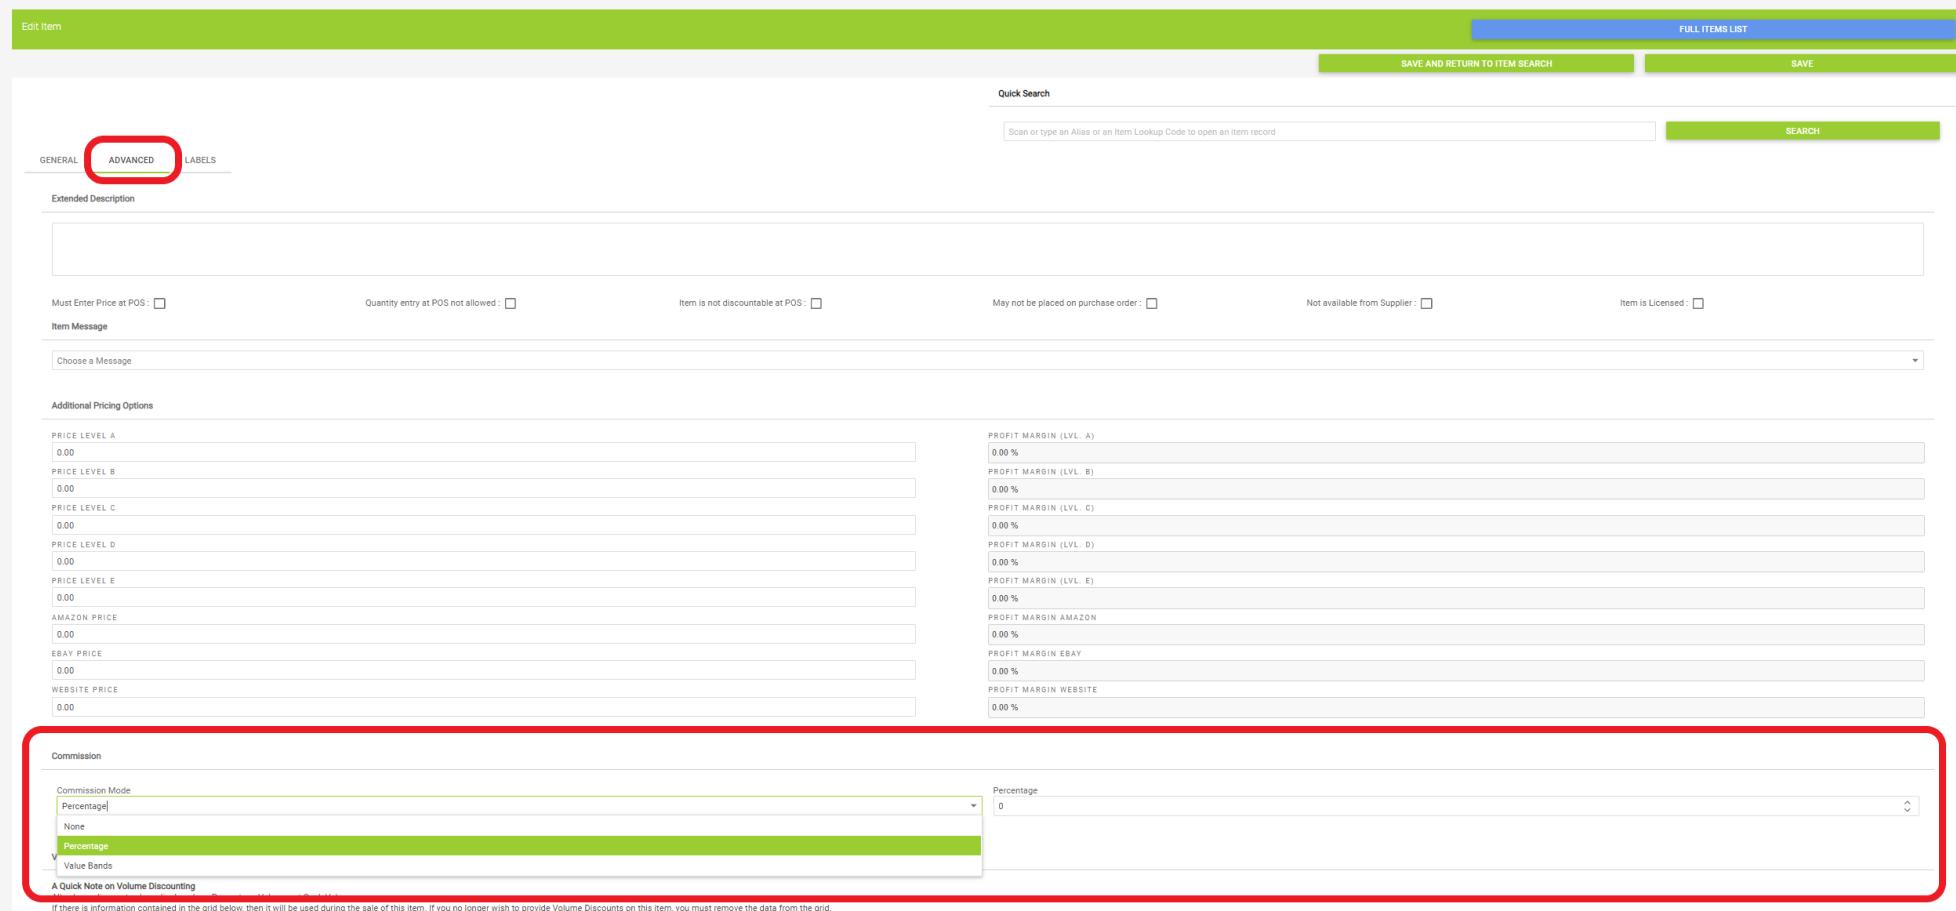 https://s3.amazonaws.com/helpjuice-static/helpjuice_production%2Fuploads%2Fupload%2Fimage%2F3798%2Fdirect%2F1613571483322-1613571483322.png